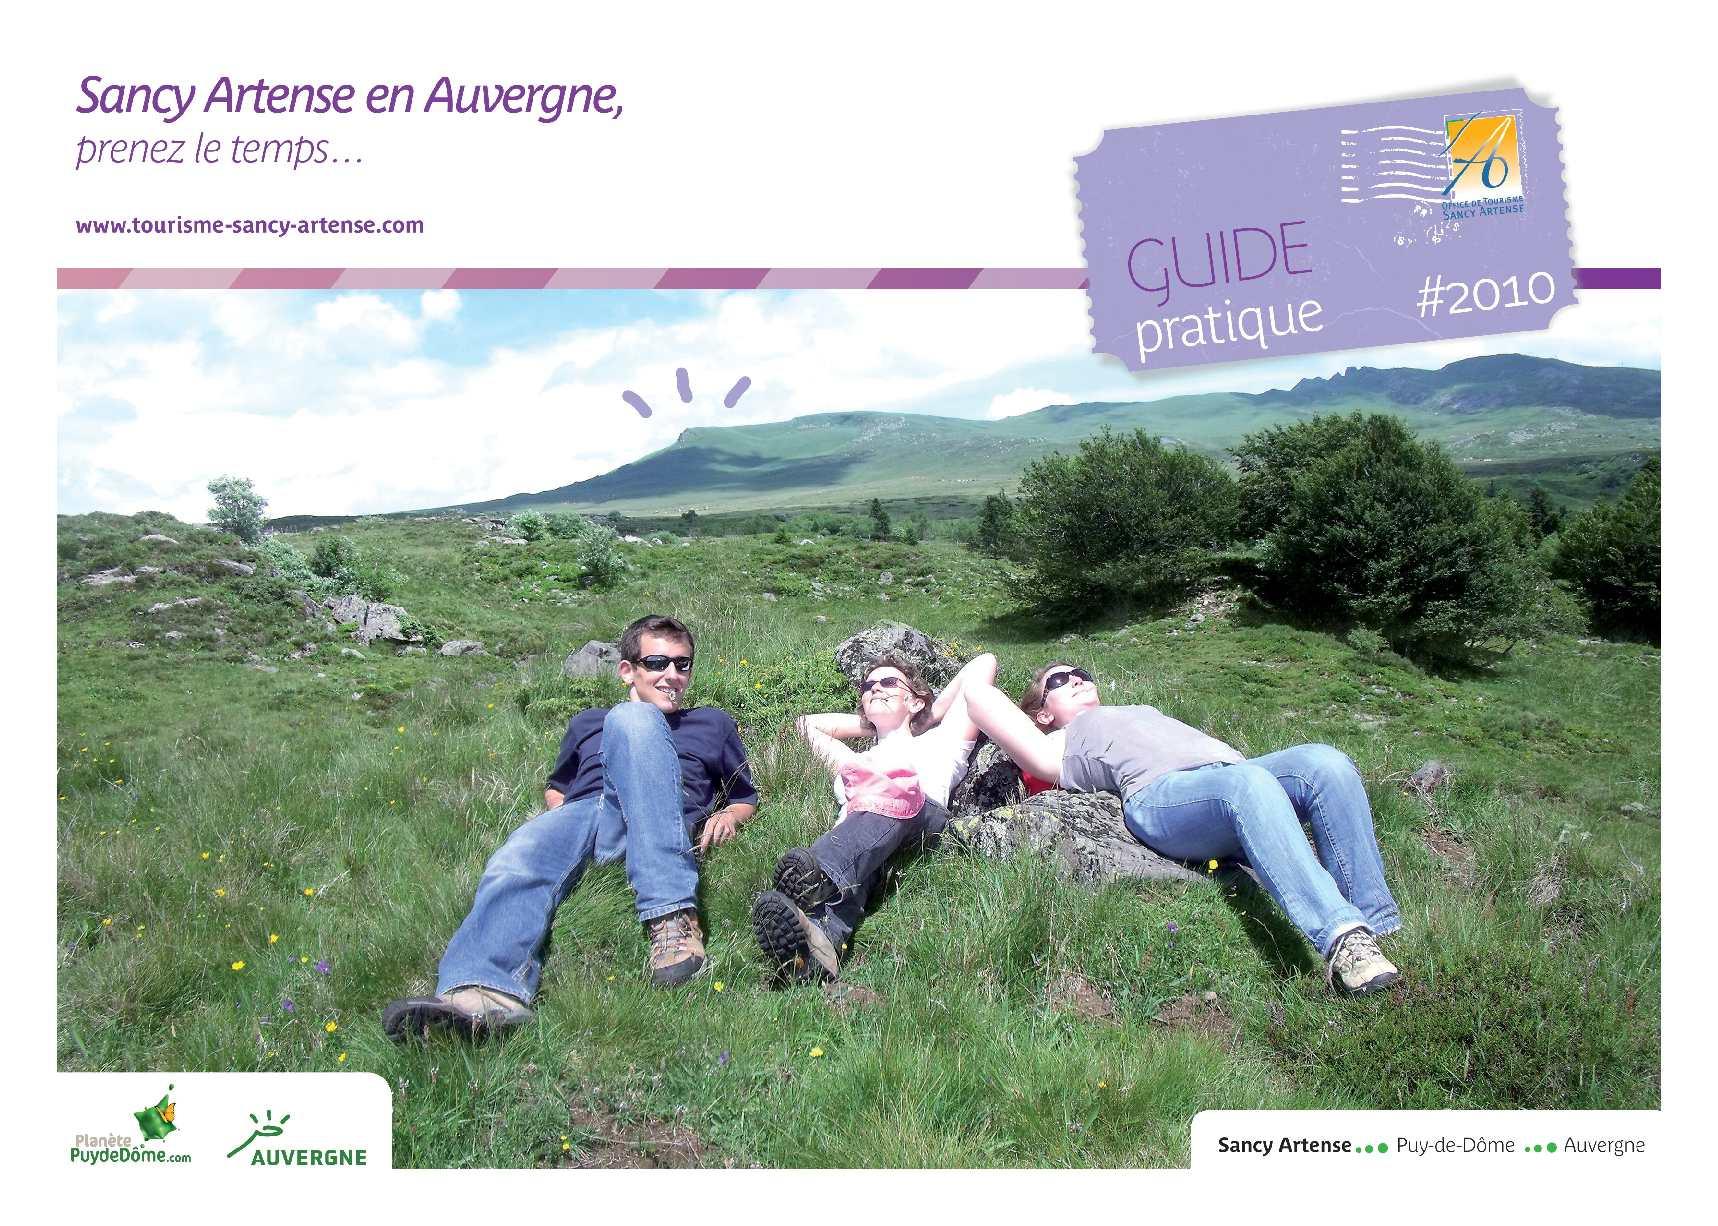 Calamo Guide Pratique Sancy Artense 2010